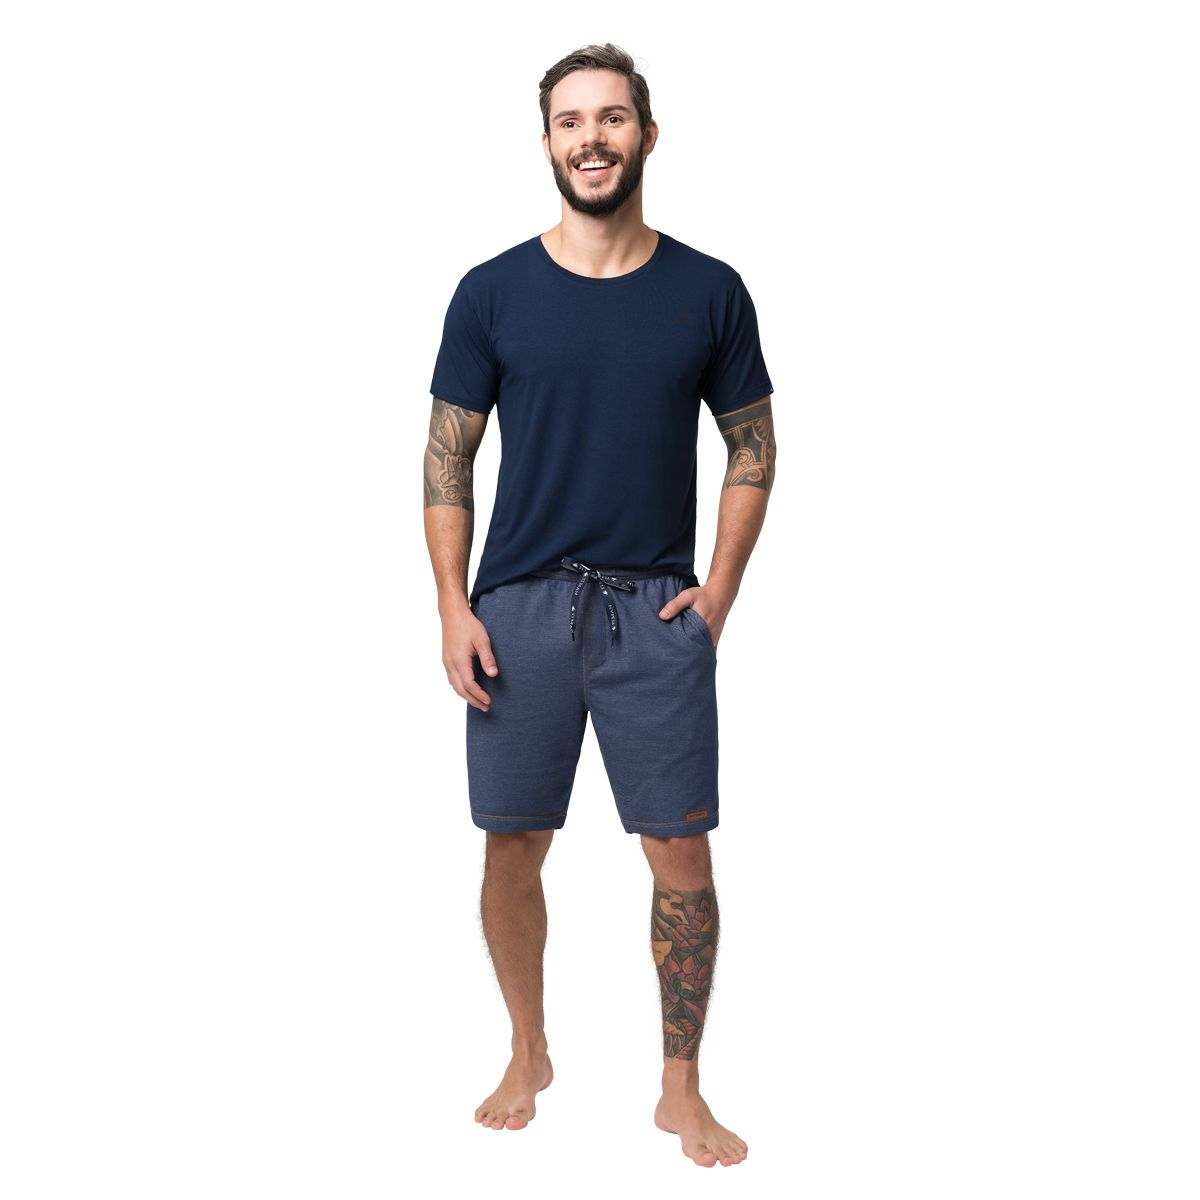 Bermuda Masculina Homewear Moletinho Azul Jeans 05.02.026